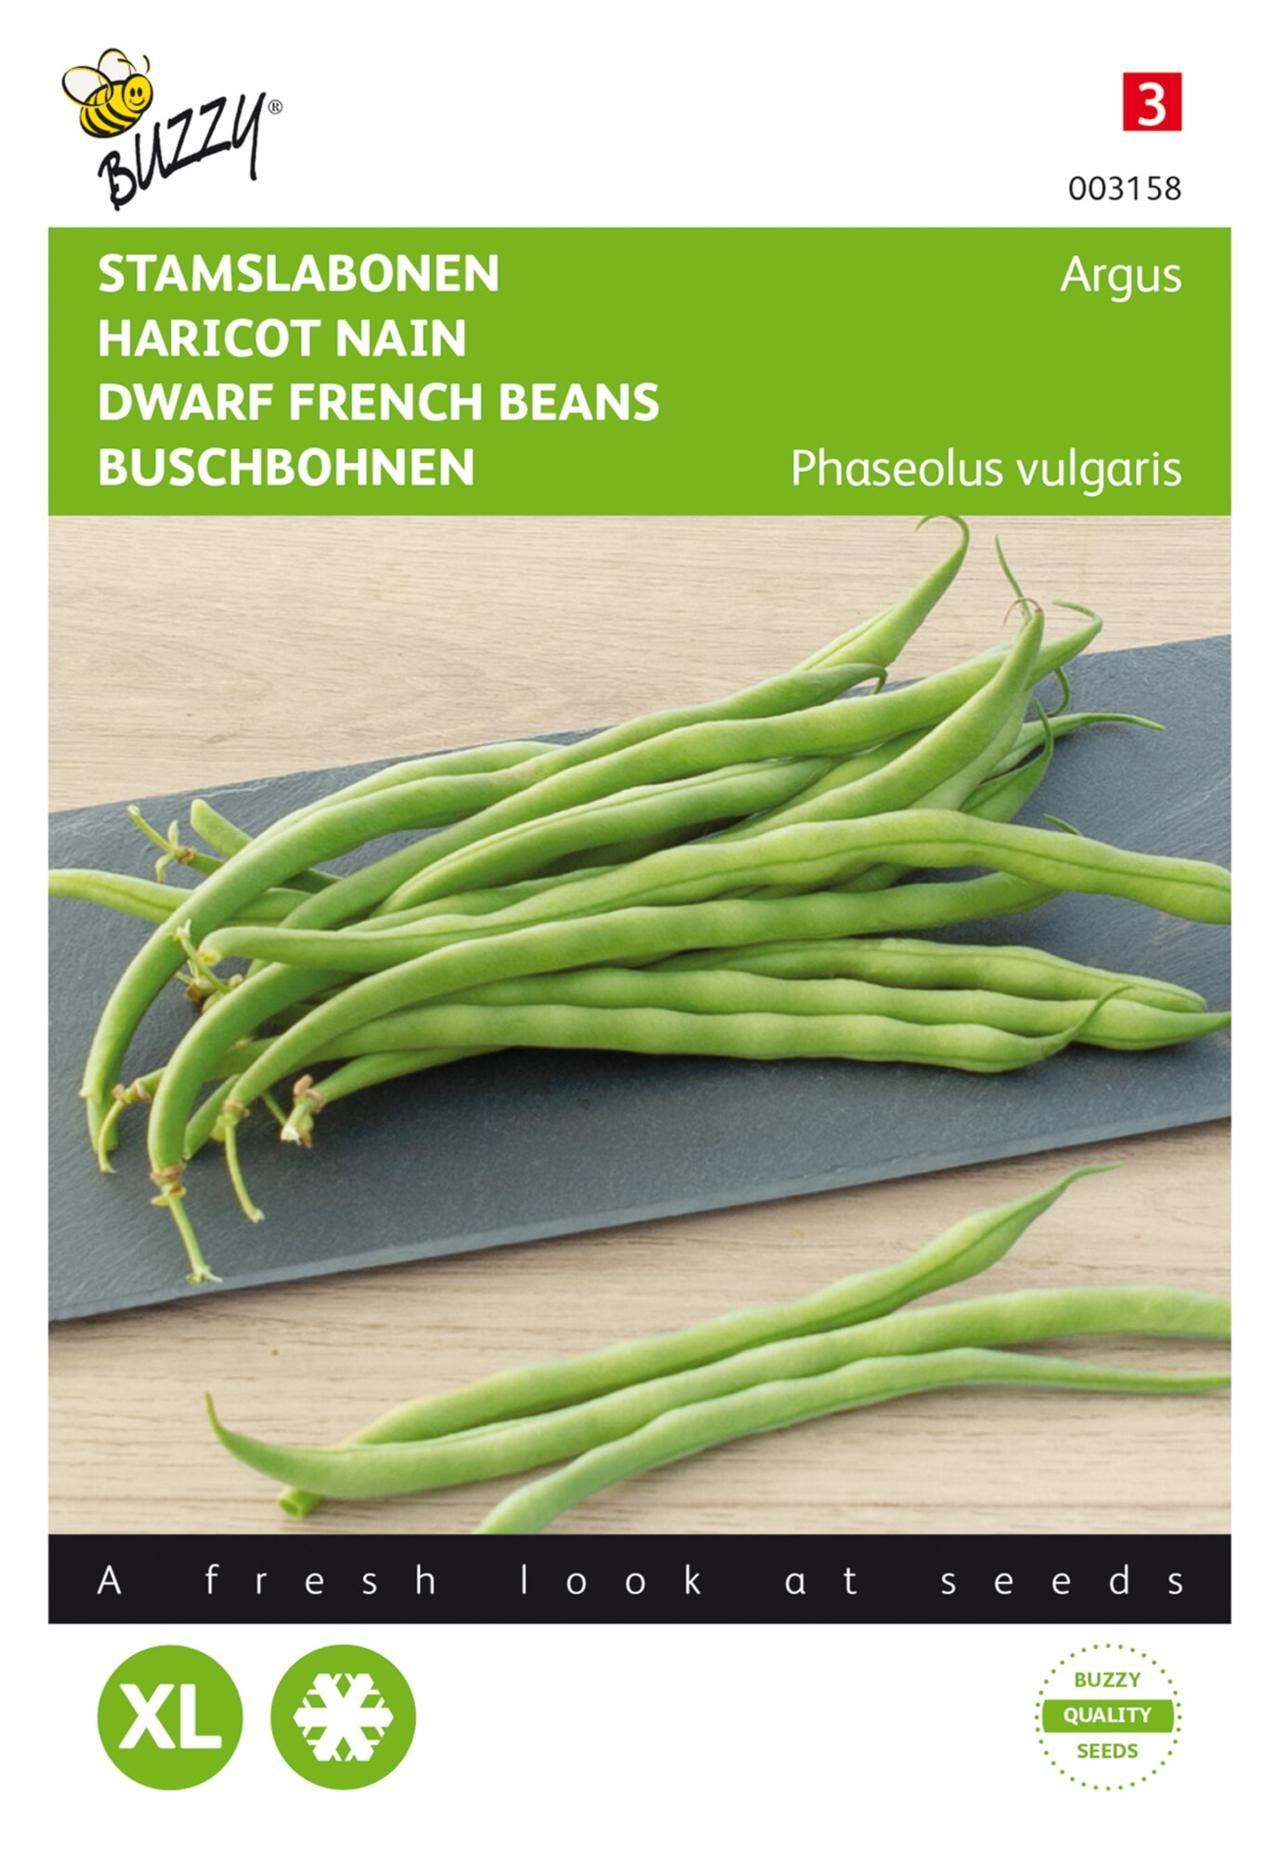 Phaseolus vulgaris 'Argus' plant